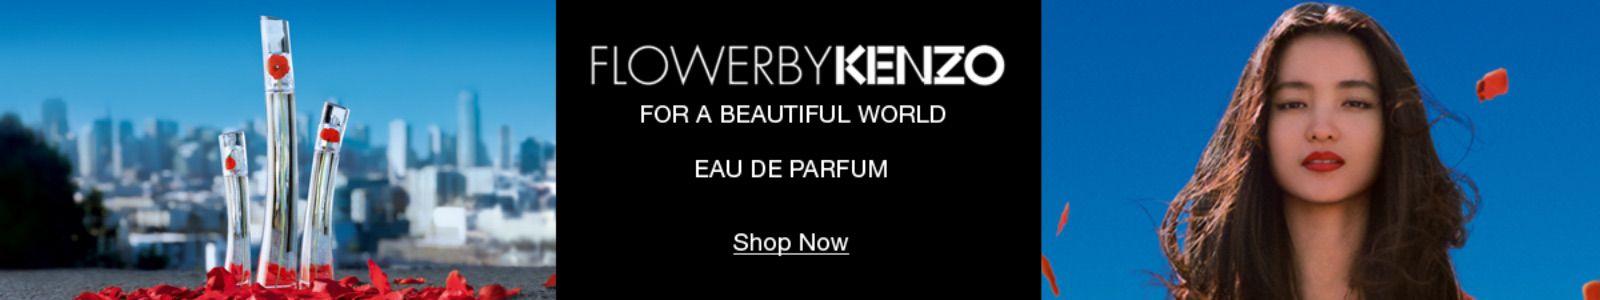 Flower By Kenzo, For a Beautiful World, Eau De Parfum